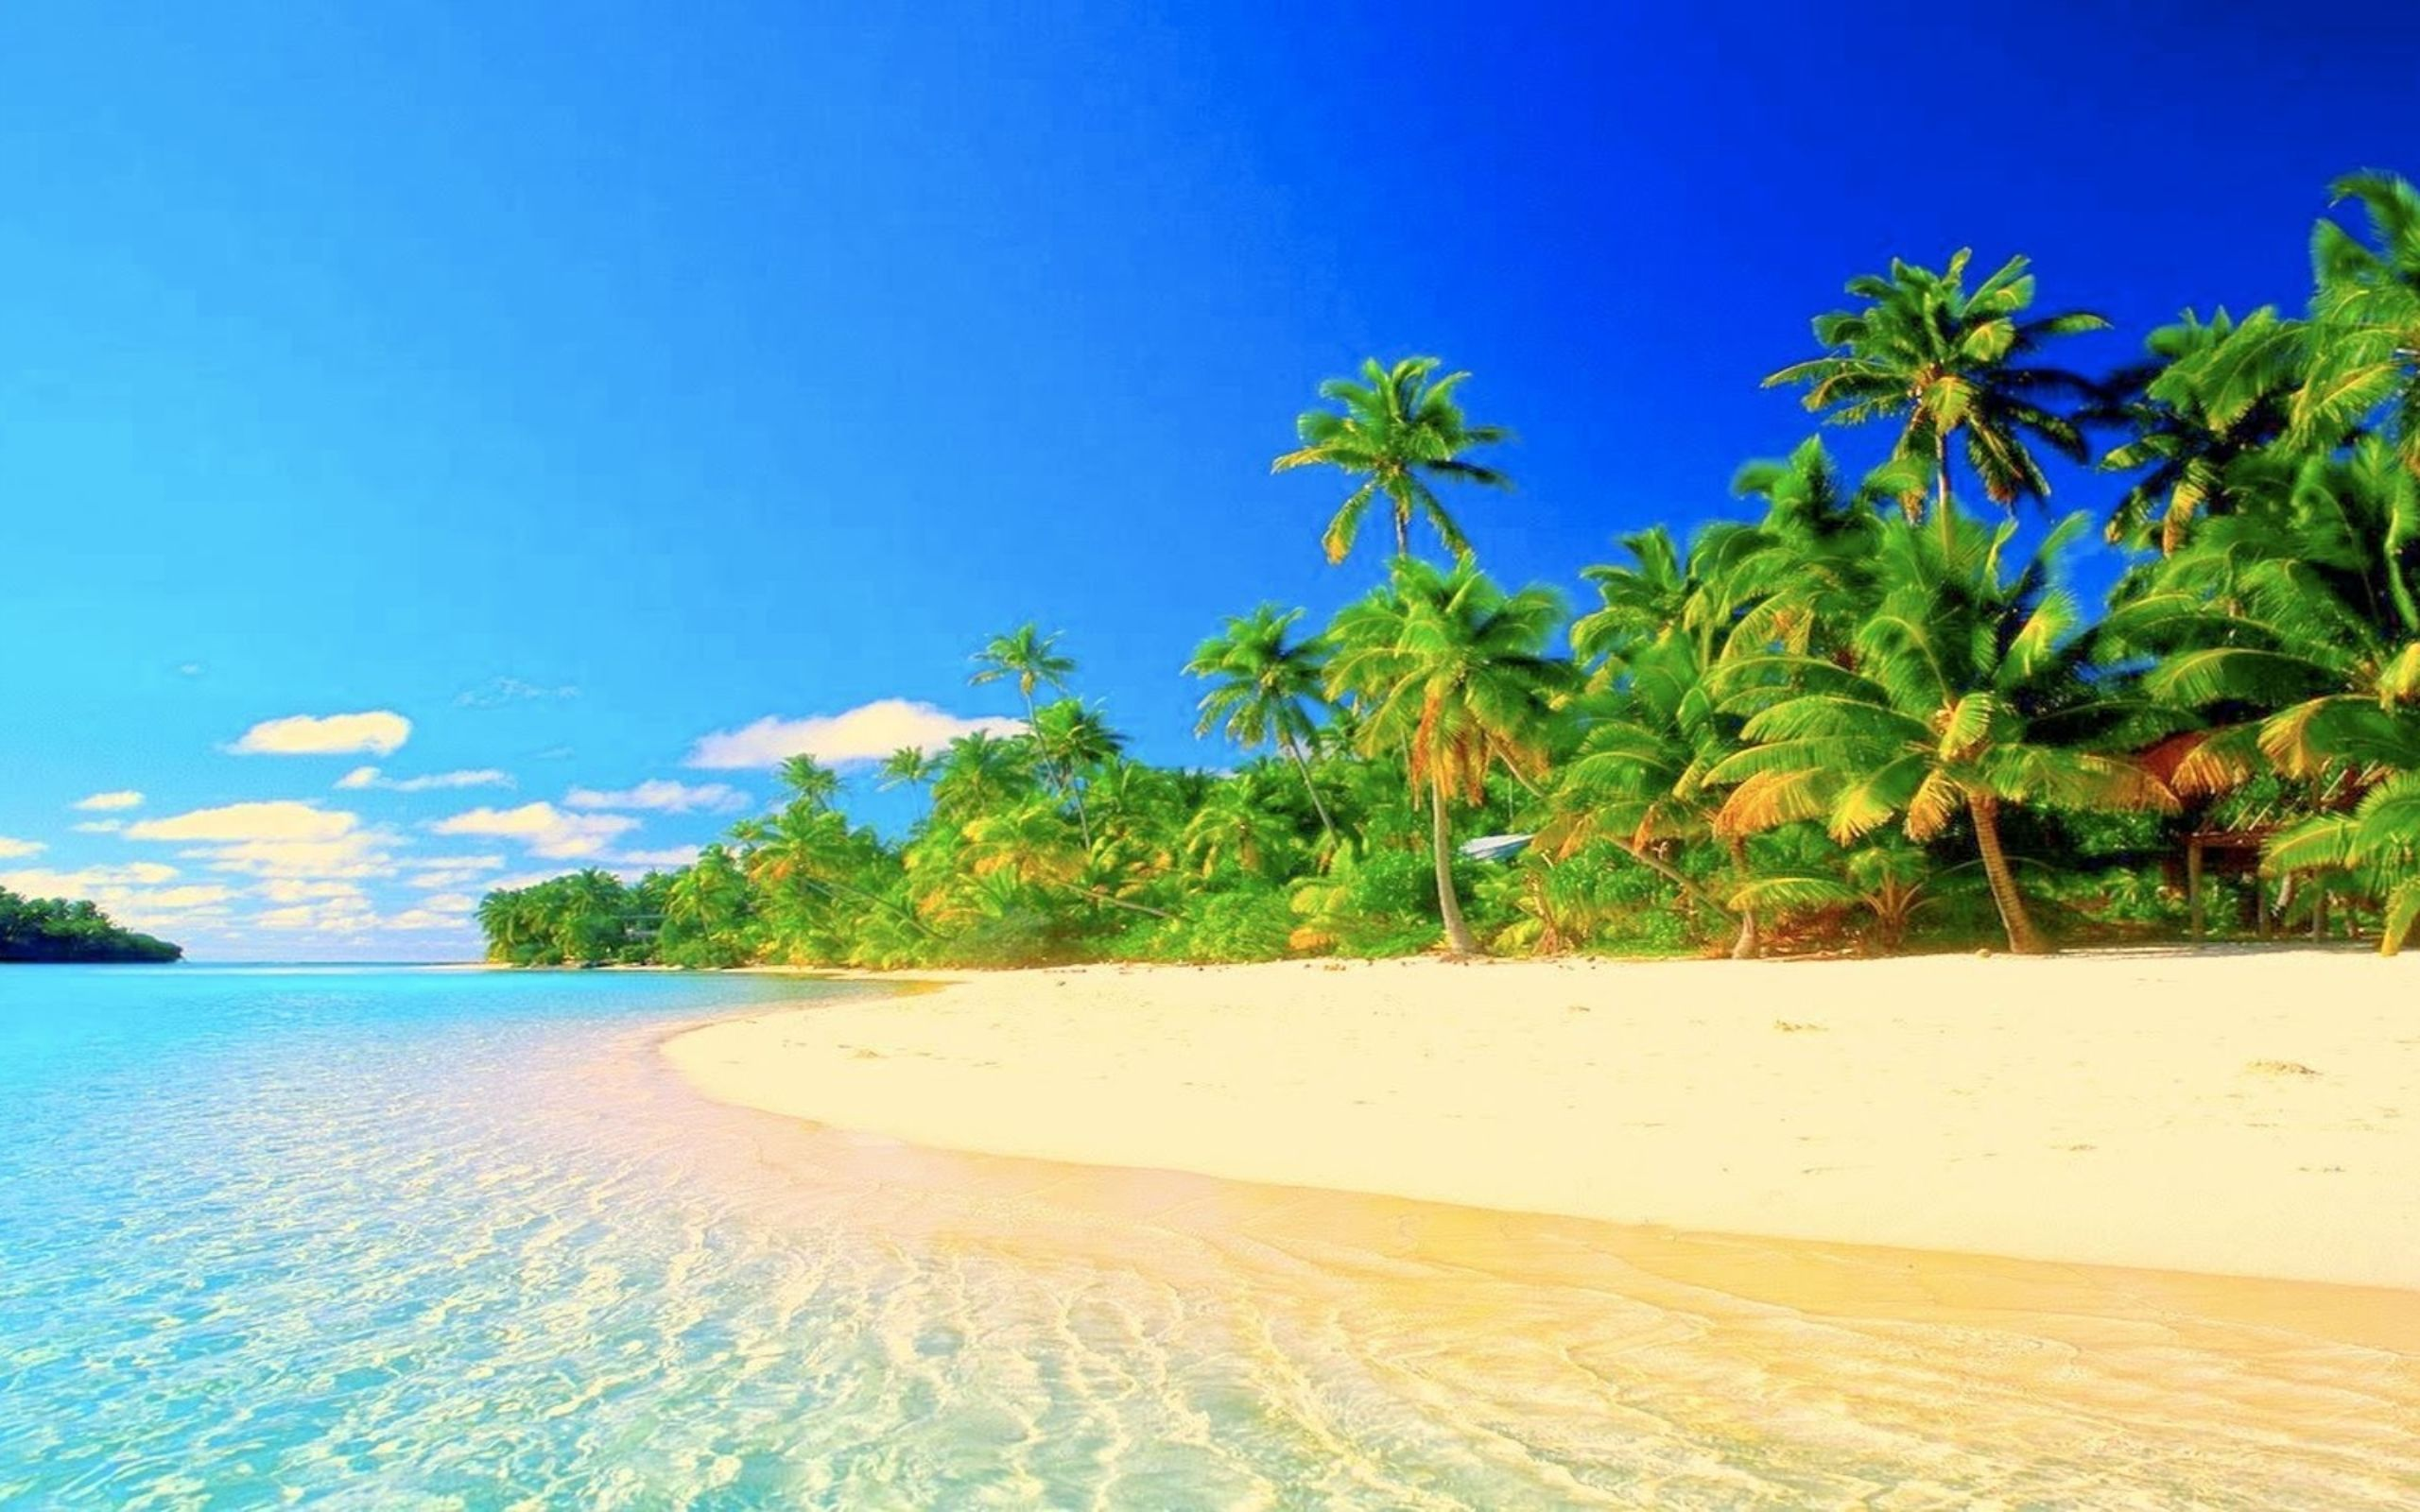 Hd Tropical Island Beach Paradise Wallpapers And Backgrounds: Tropical Paradise Desktop Wallpapers